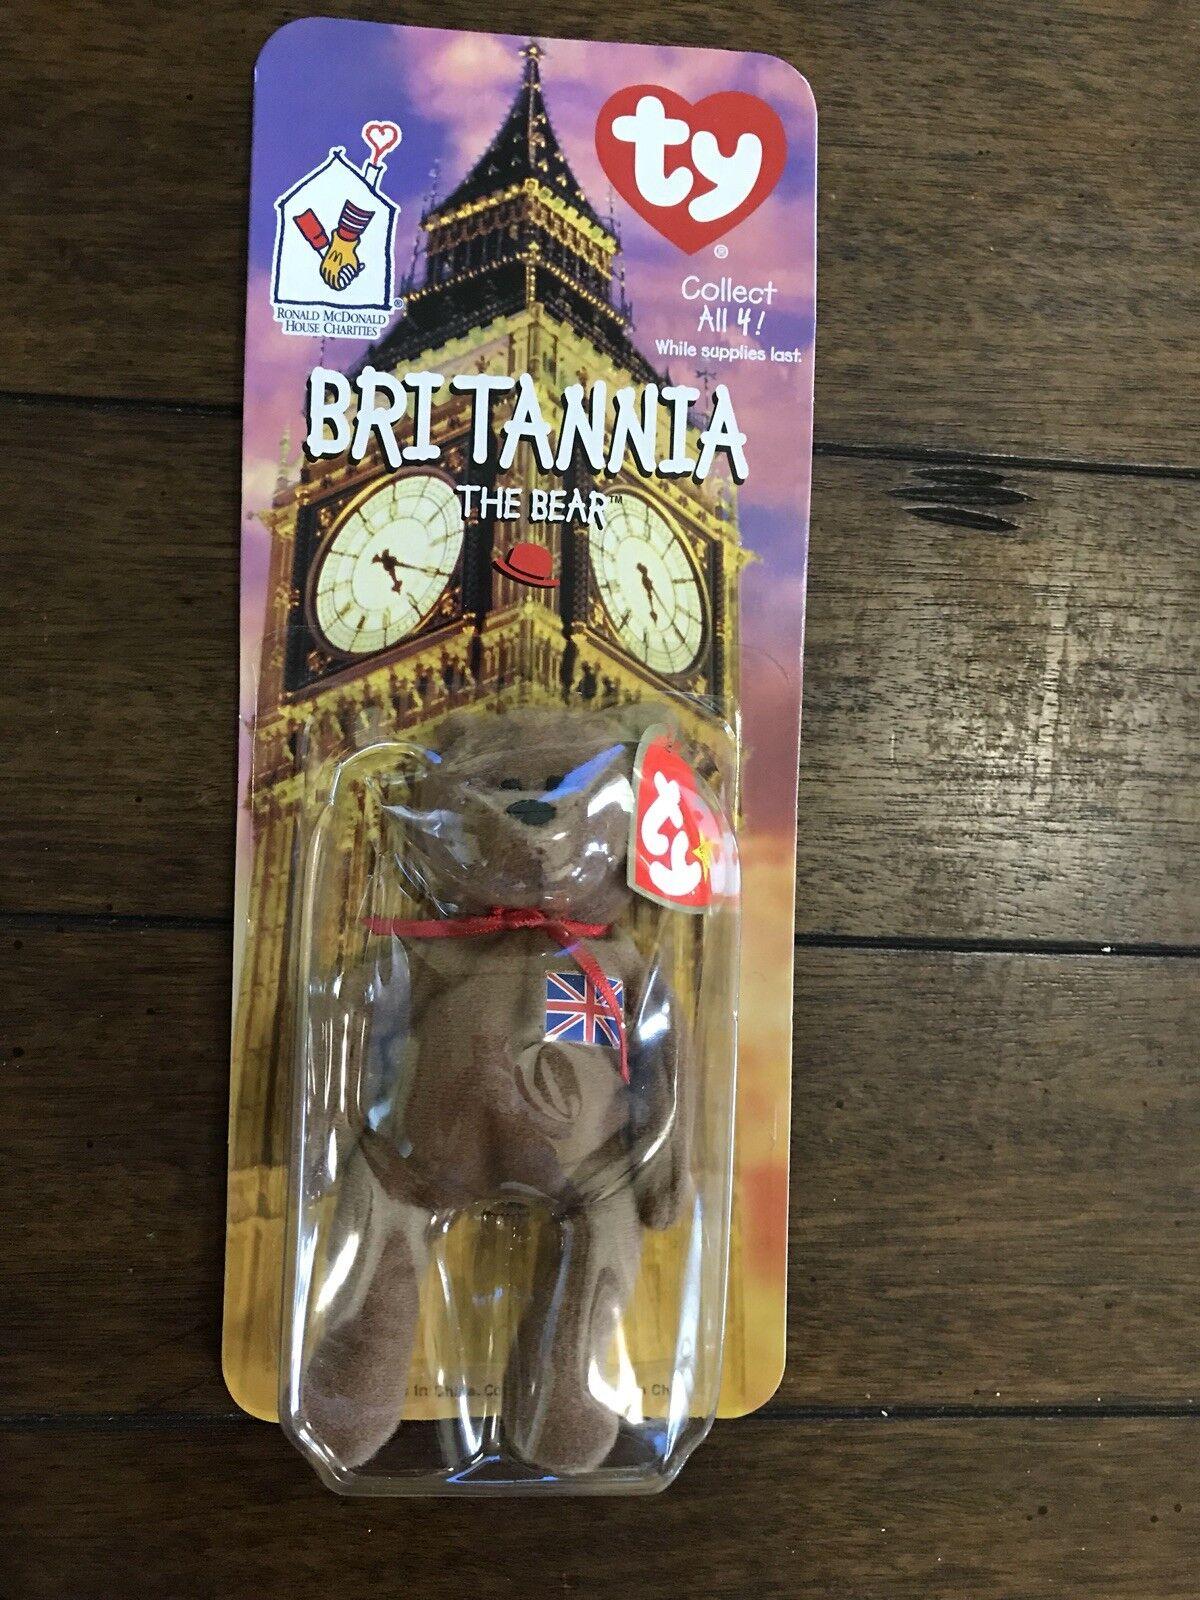 RARE-Ty Brittania the Bear - - - McDonalds Teenie Beanie Retired With Both Errors e1e4b1